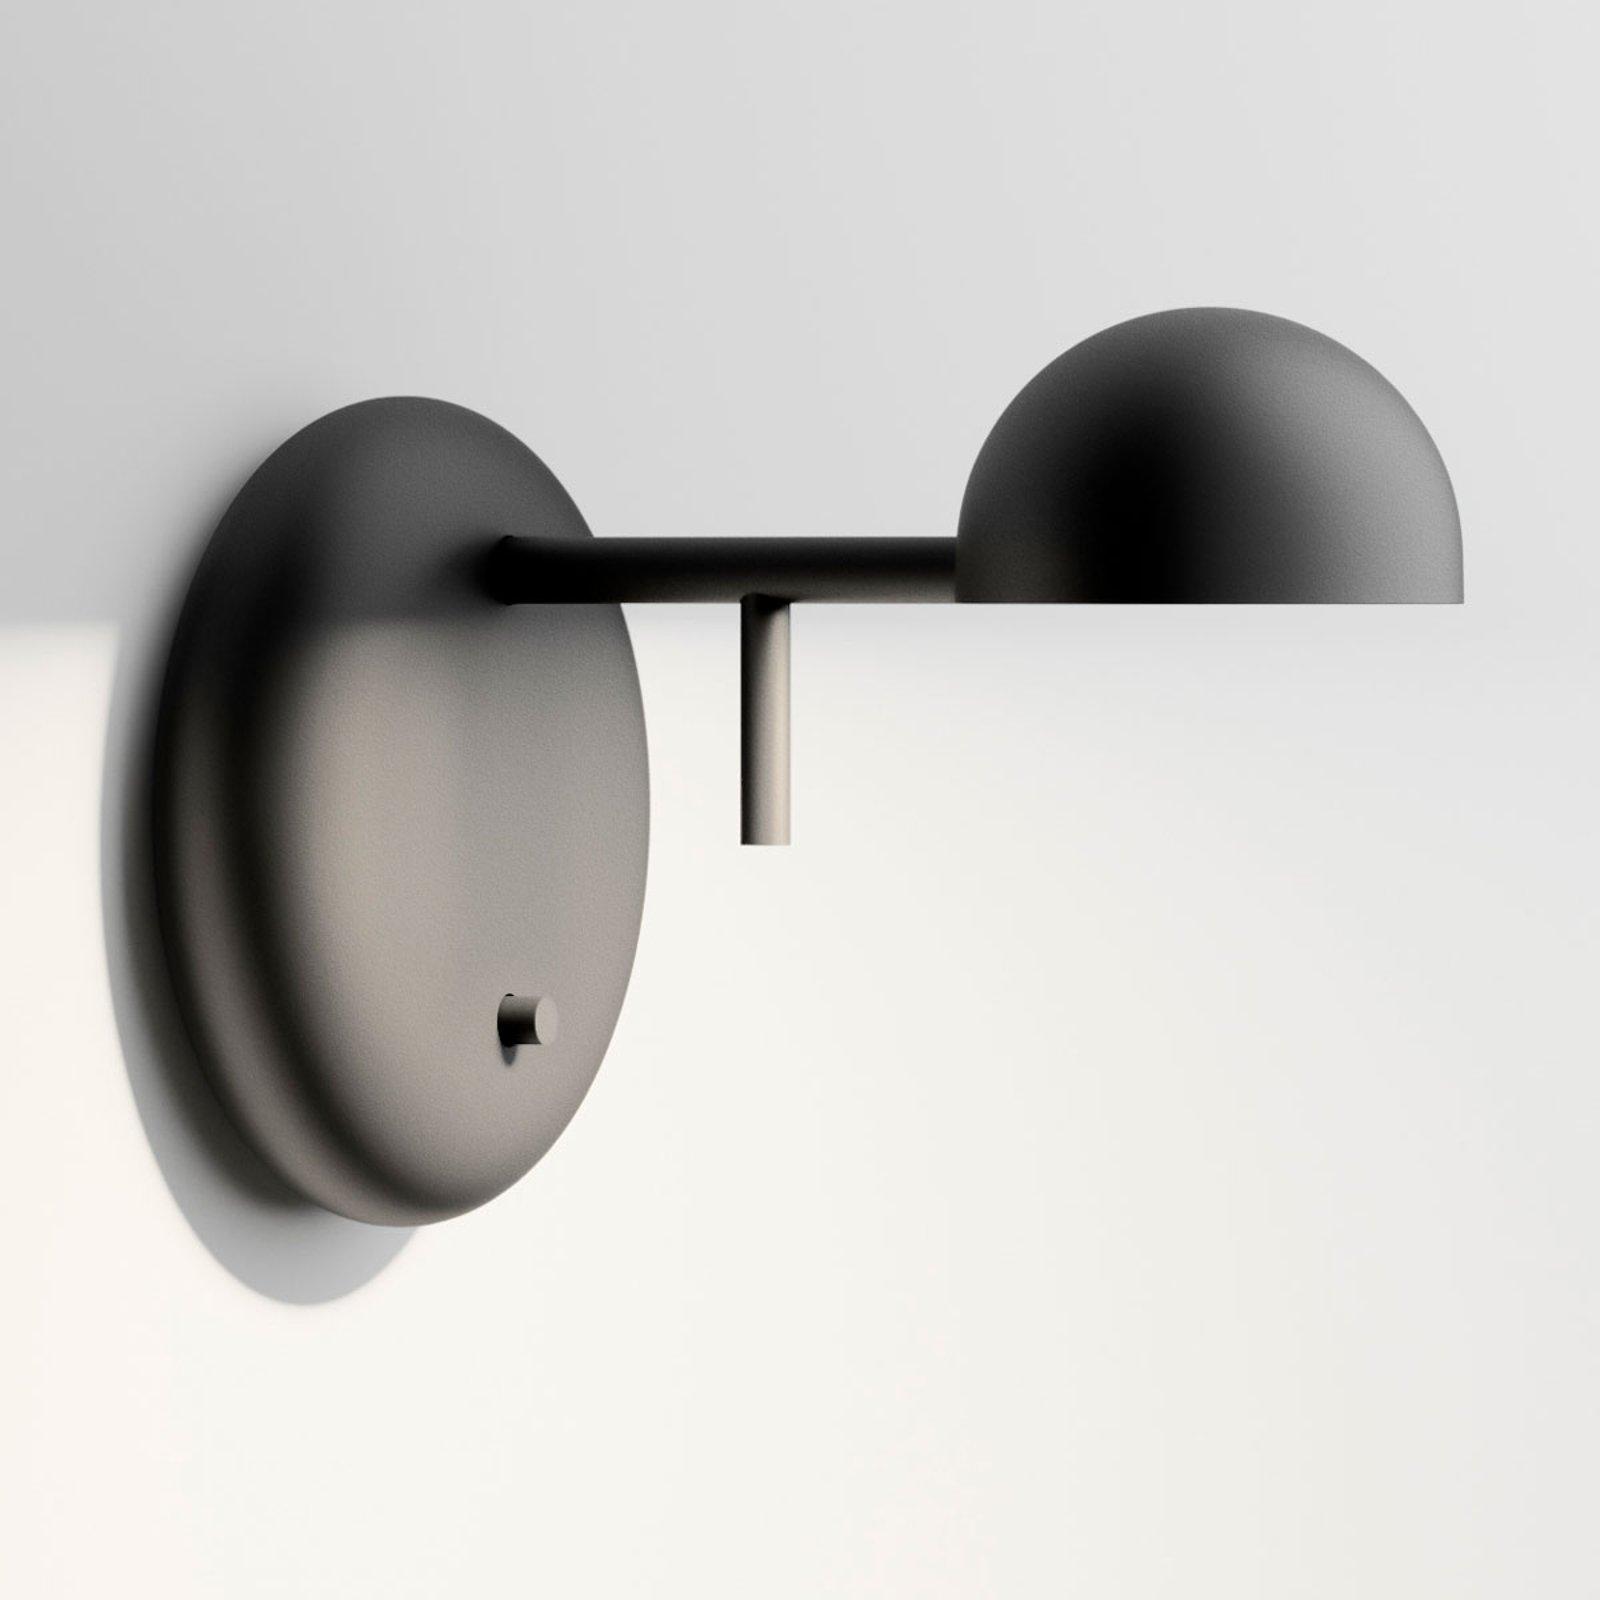 Vibia Pin 1675 LED-vegglampe, 11 cm, svart